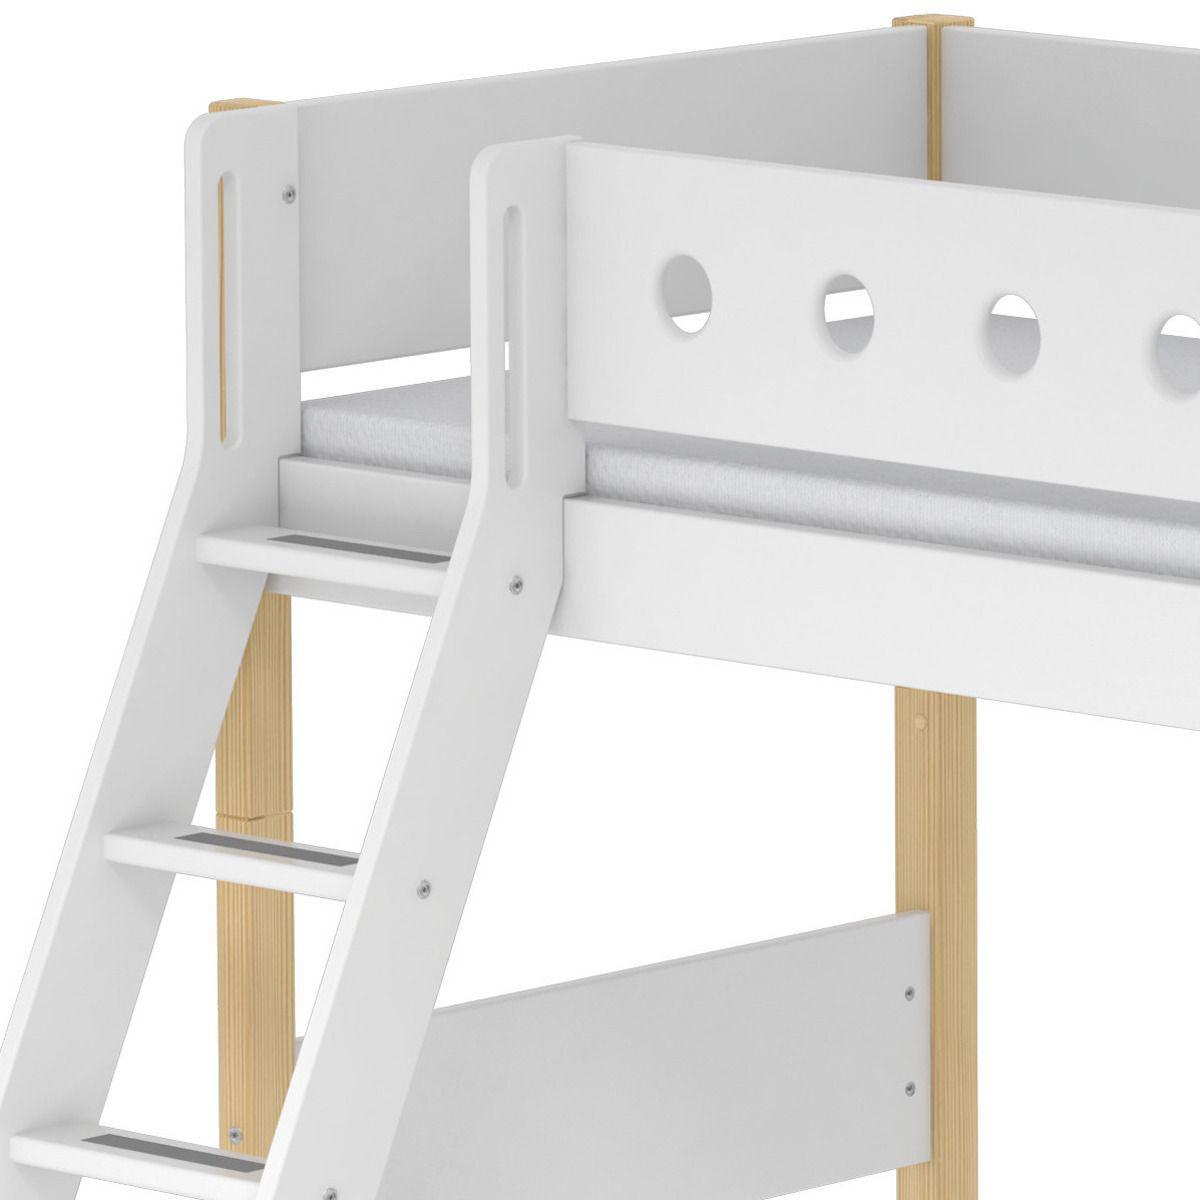 Cama semi alta 90x200 WHITE Flexa escalera inclinada barrera blanco patas abedul